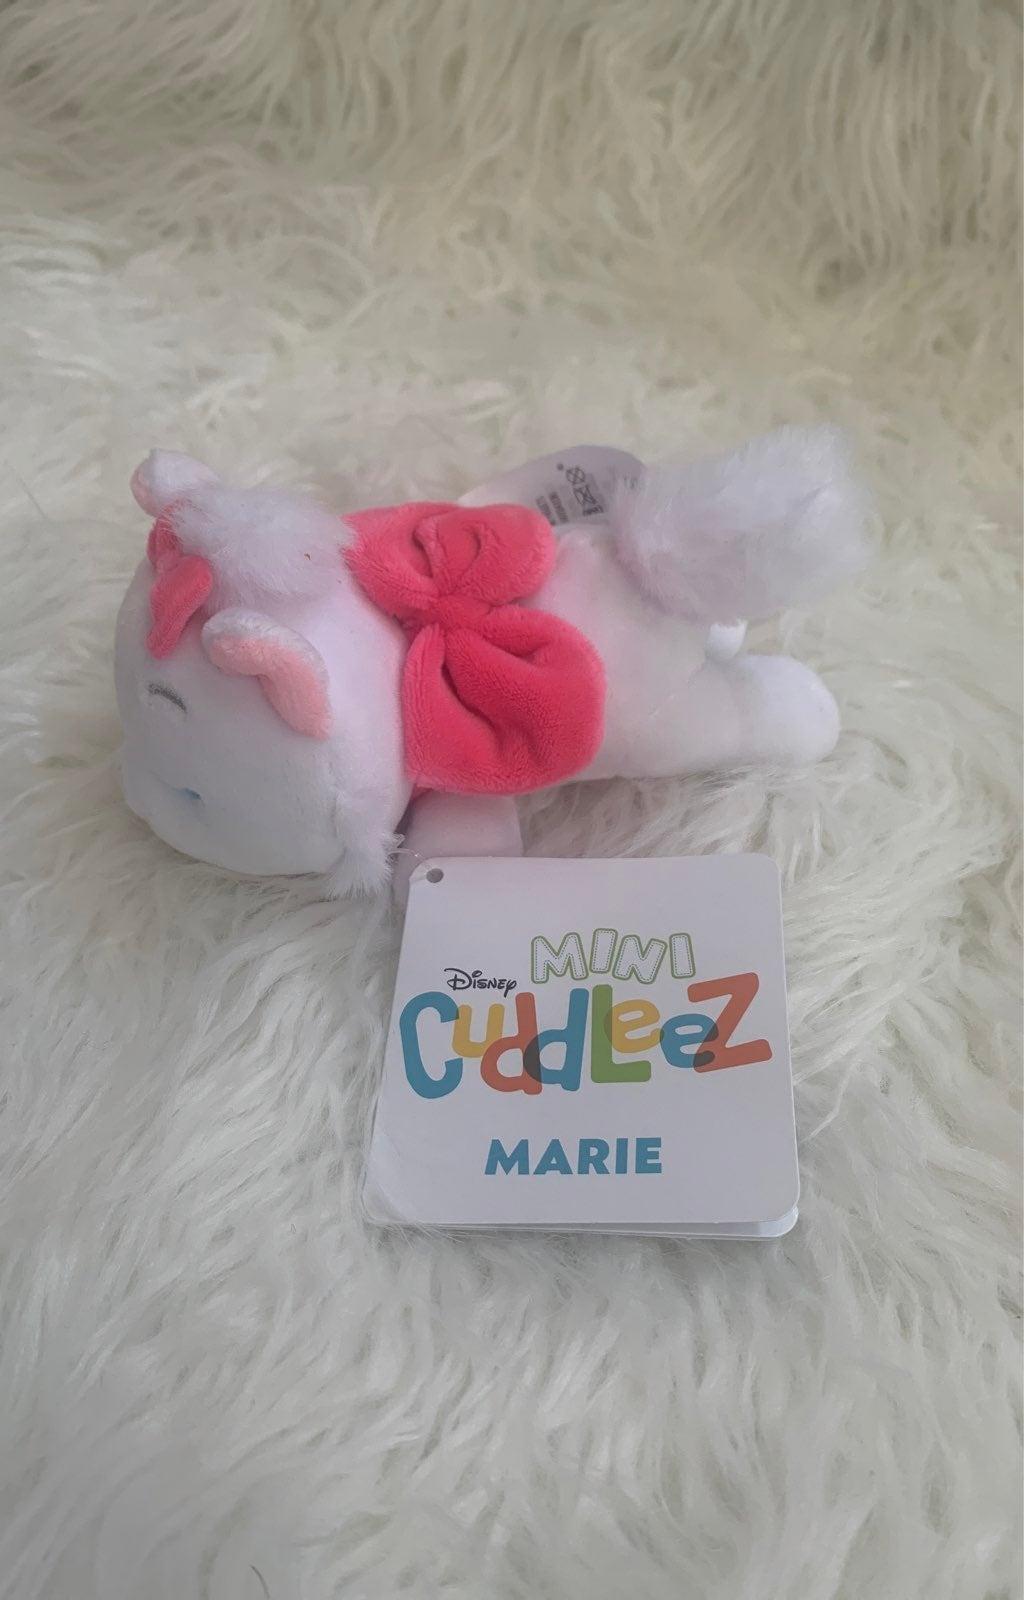 Reserved for Caryn Disney Cuddlez Marie